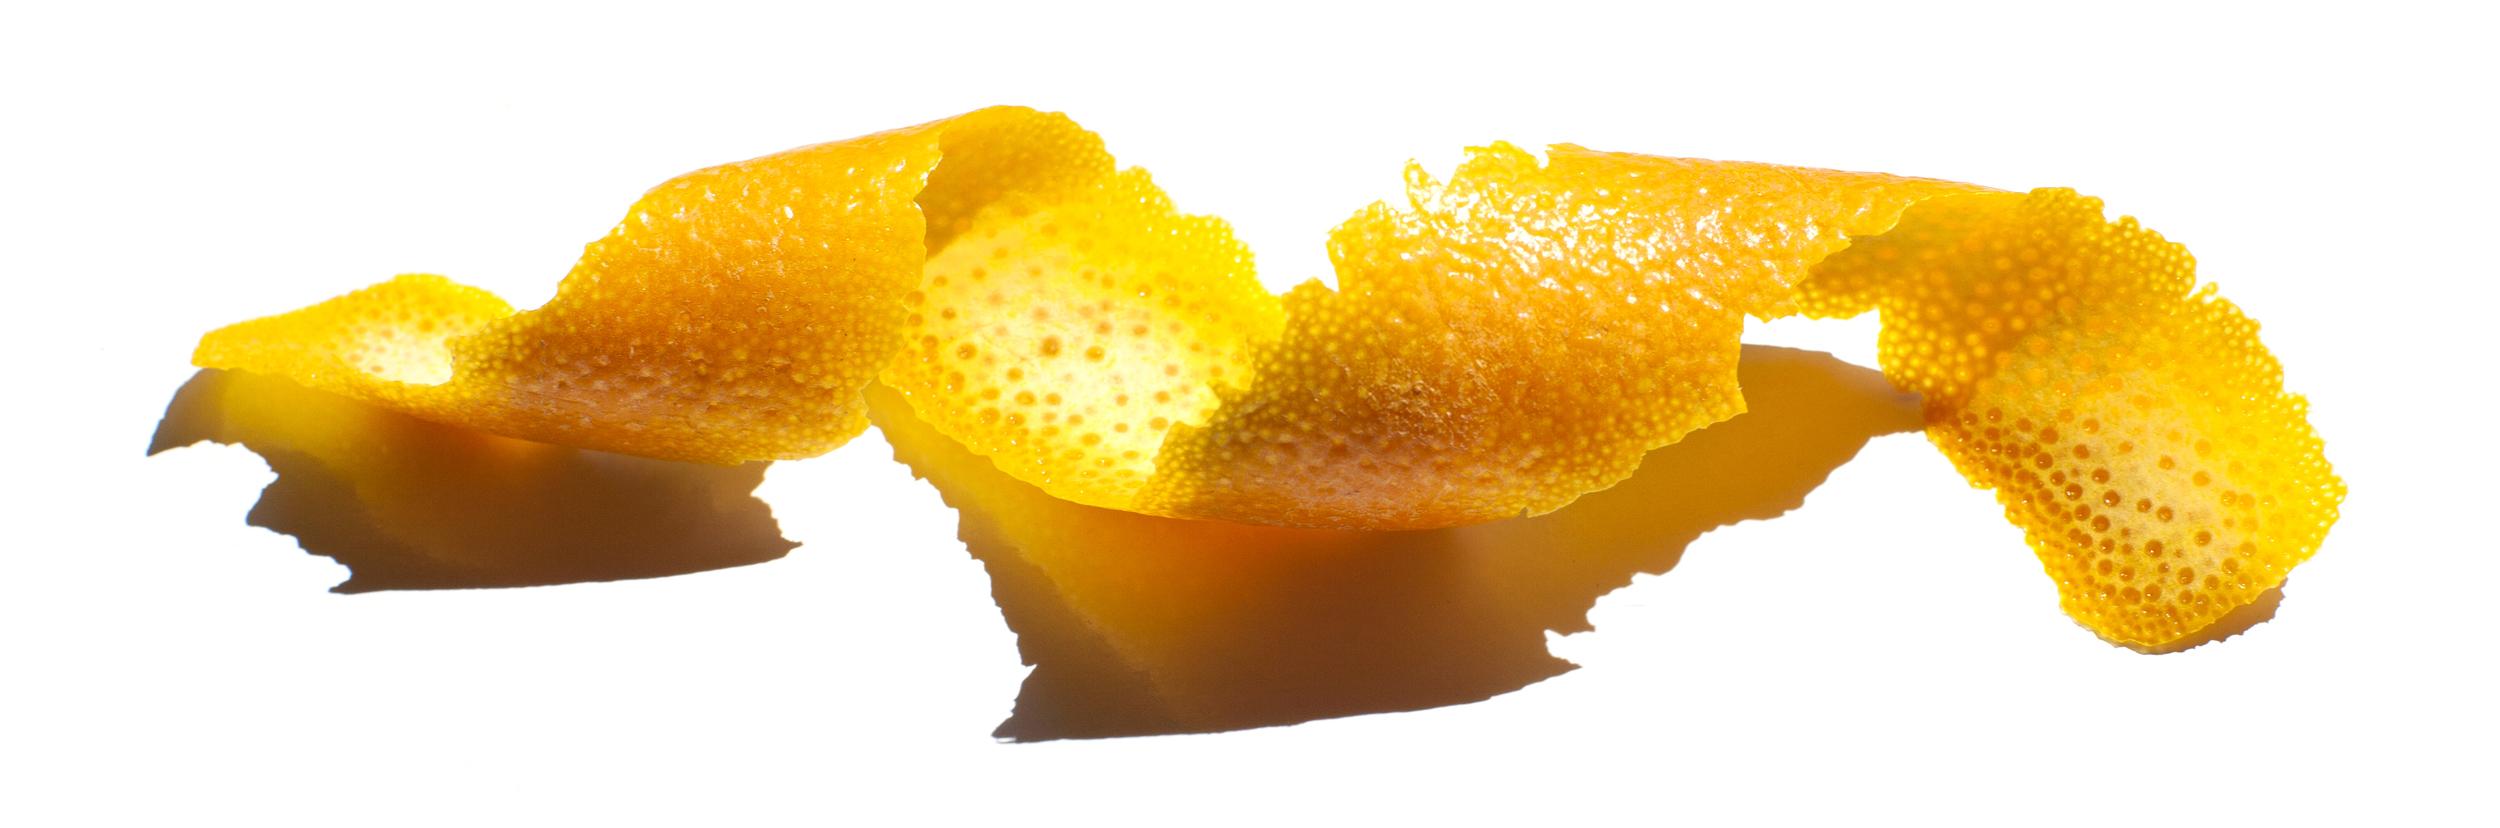 orange_peel.jpg